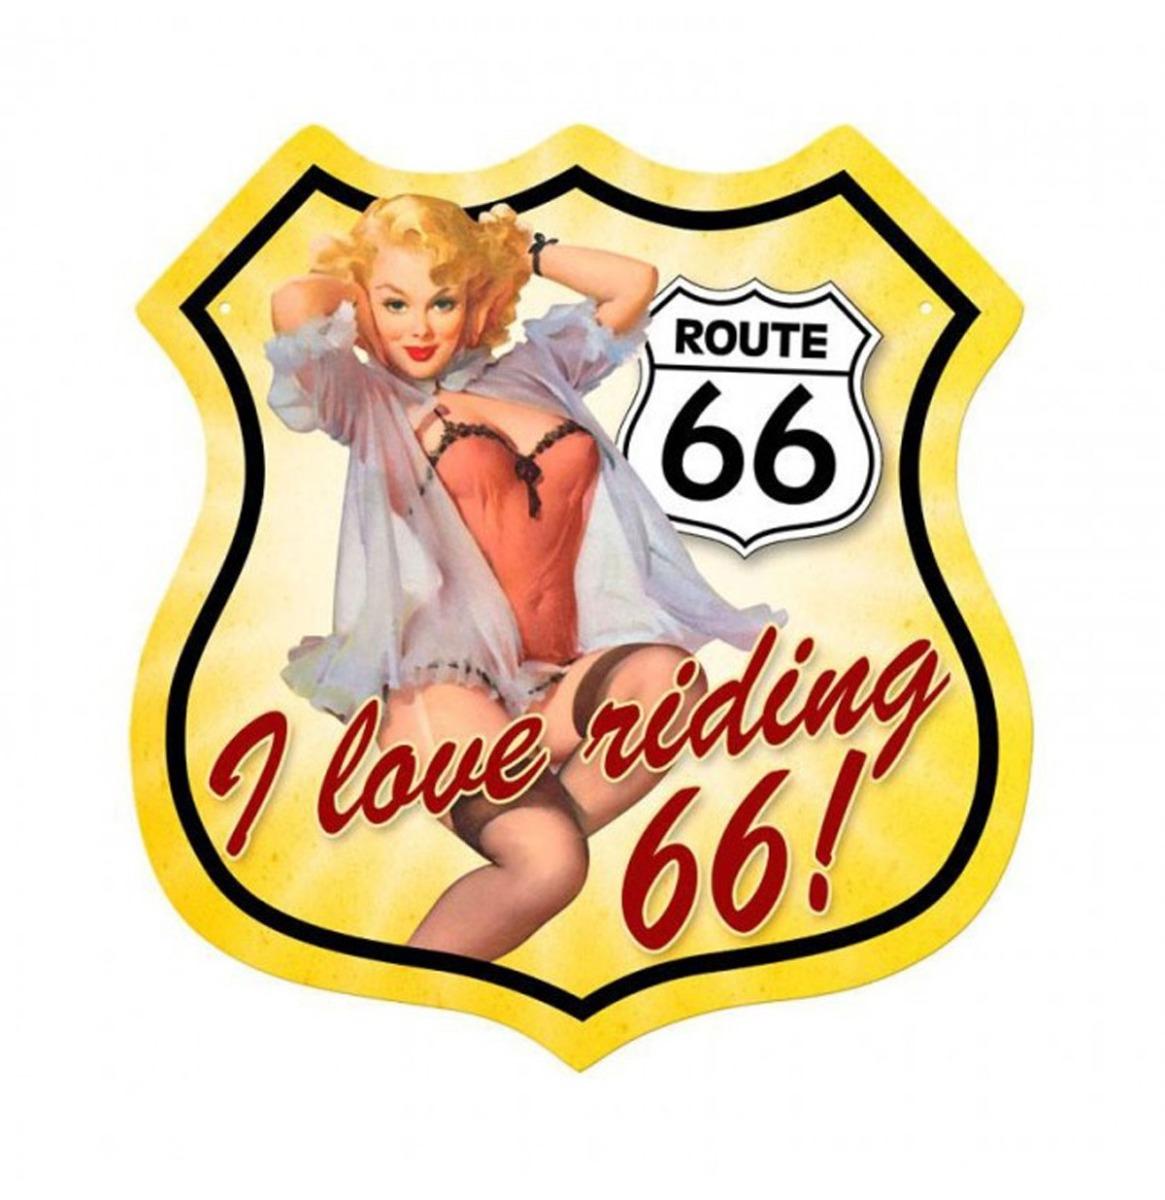 Route 66 I Love Riding 66 Pin-Up Zwaar Metalen Bord 37,5 x 39 cm